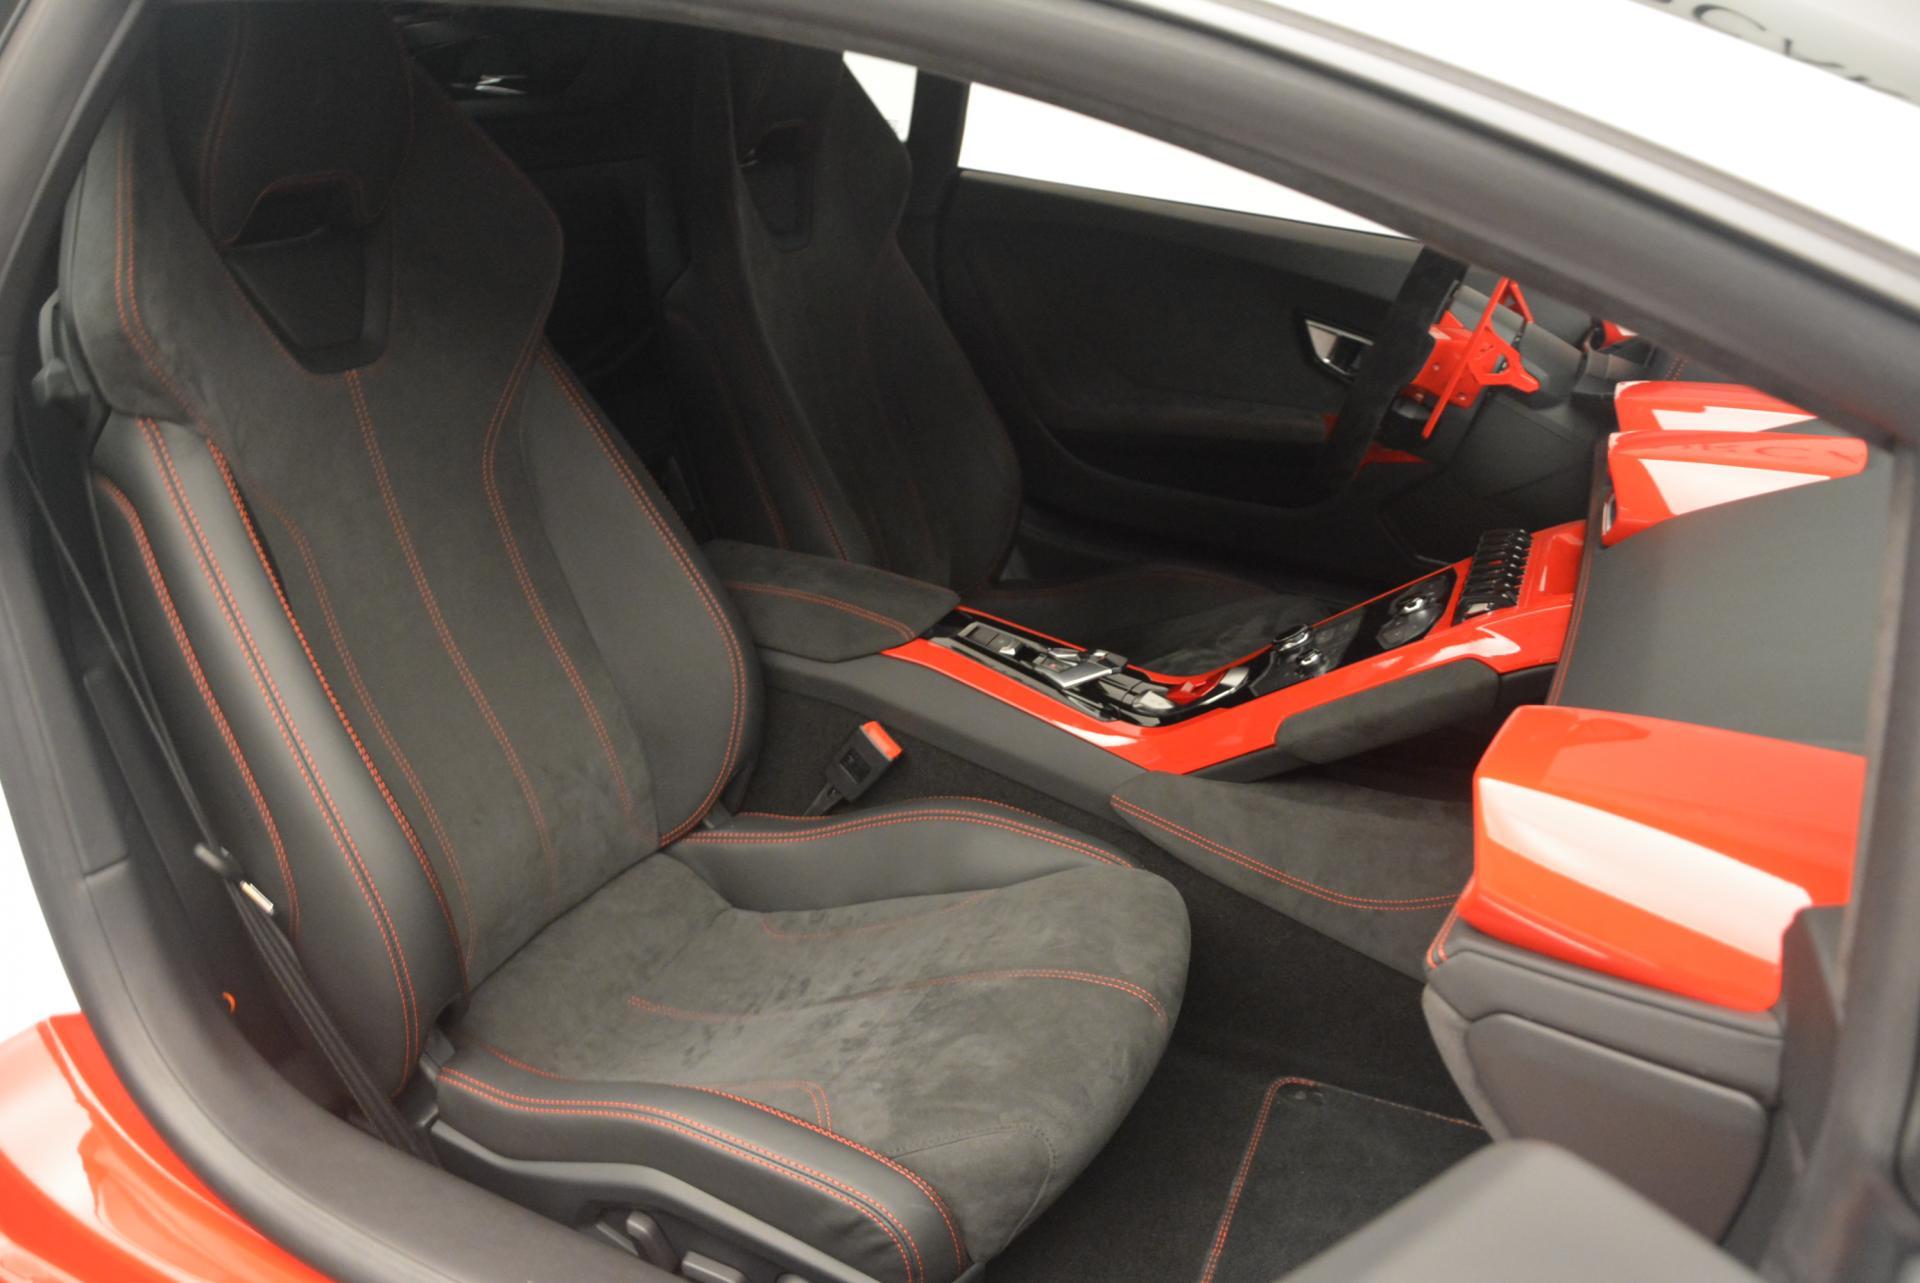 Used 2015 Lamborghini Huracan LP610-4 For Sale In Greenwich, CT 114_p18